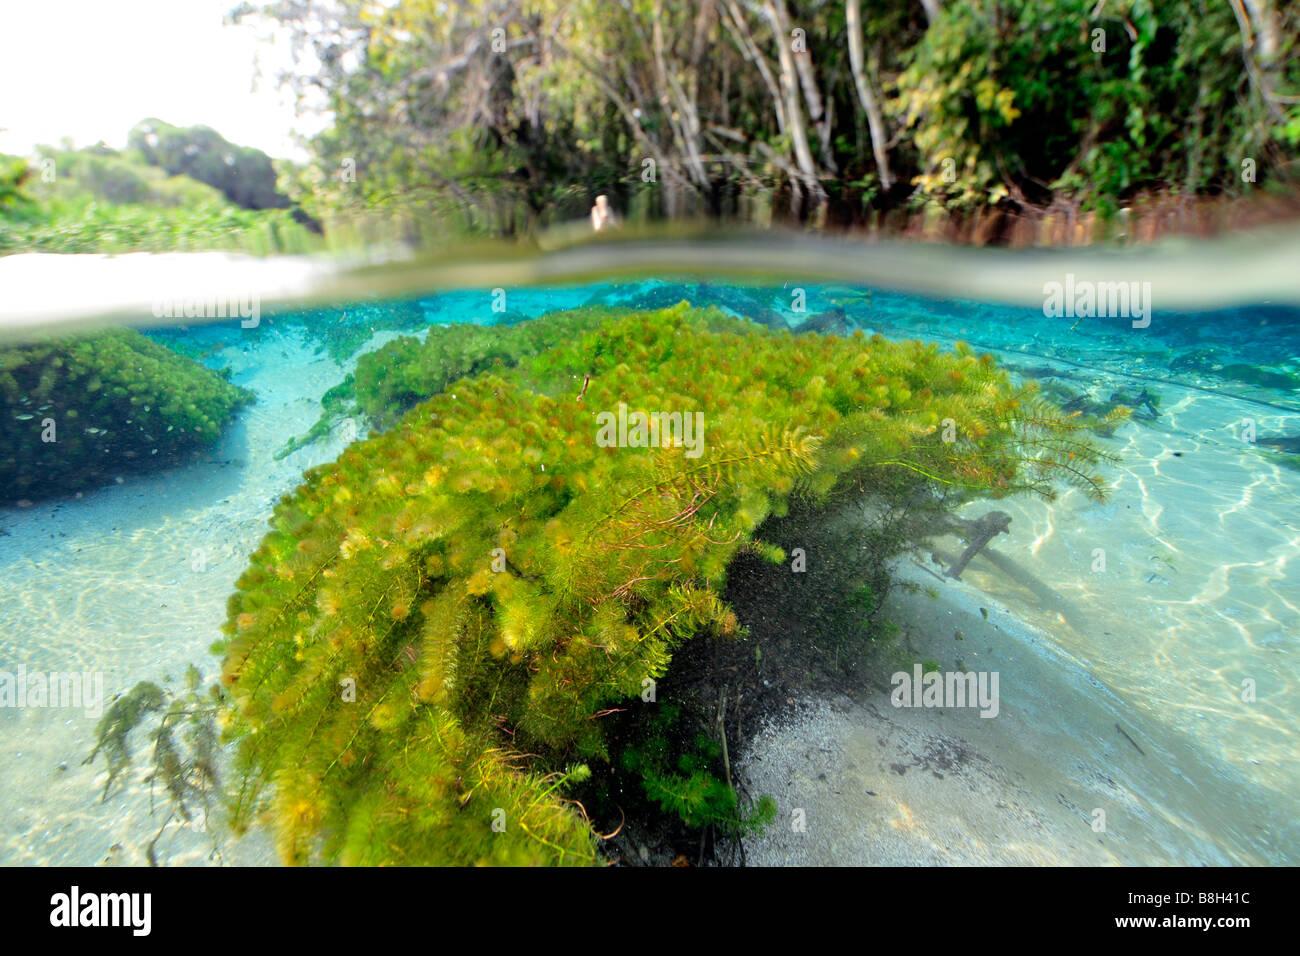 Underwater vegetation, predominantly stonewort algae, Chara rusbyana, at Sucuri River, Bonito, Mato Grosso do Sul, - Stock Image